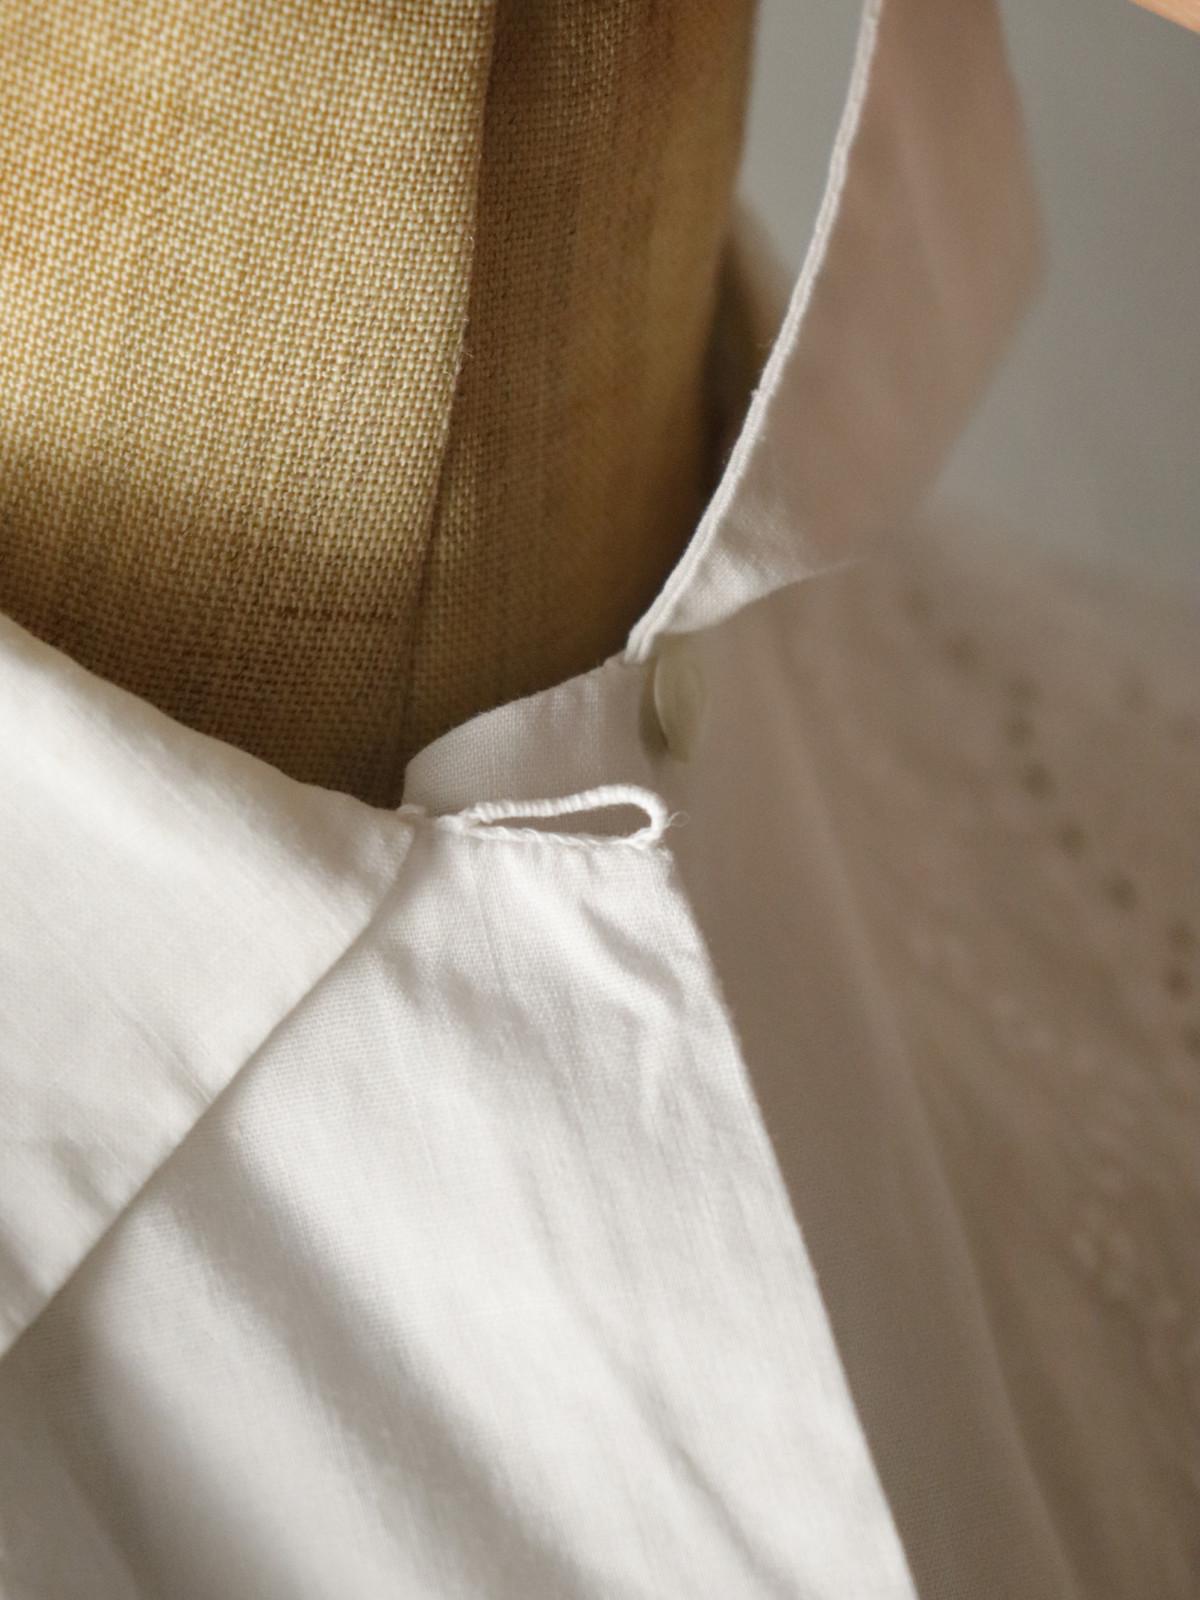 vintage,europe,linen,cotton,nightwear,lace,enbroidery,blouse